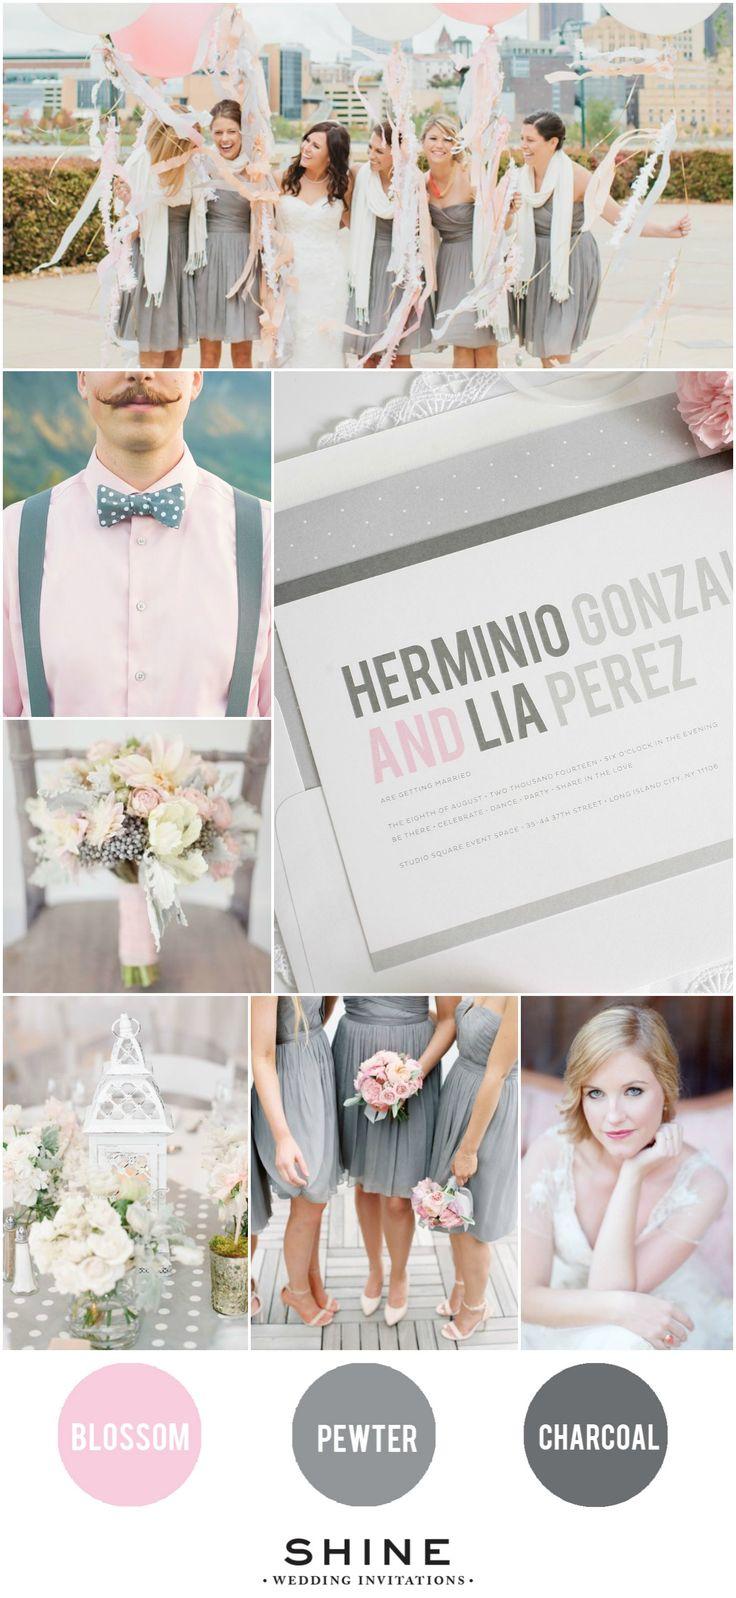 Blush and Gray Polka Dot Wedding Inspiration from Shine Wedding Invitations